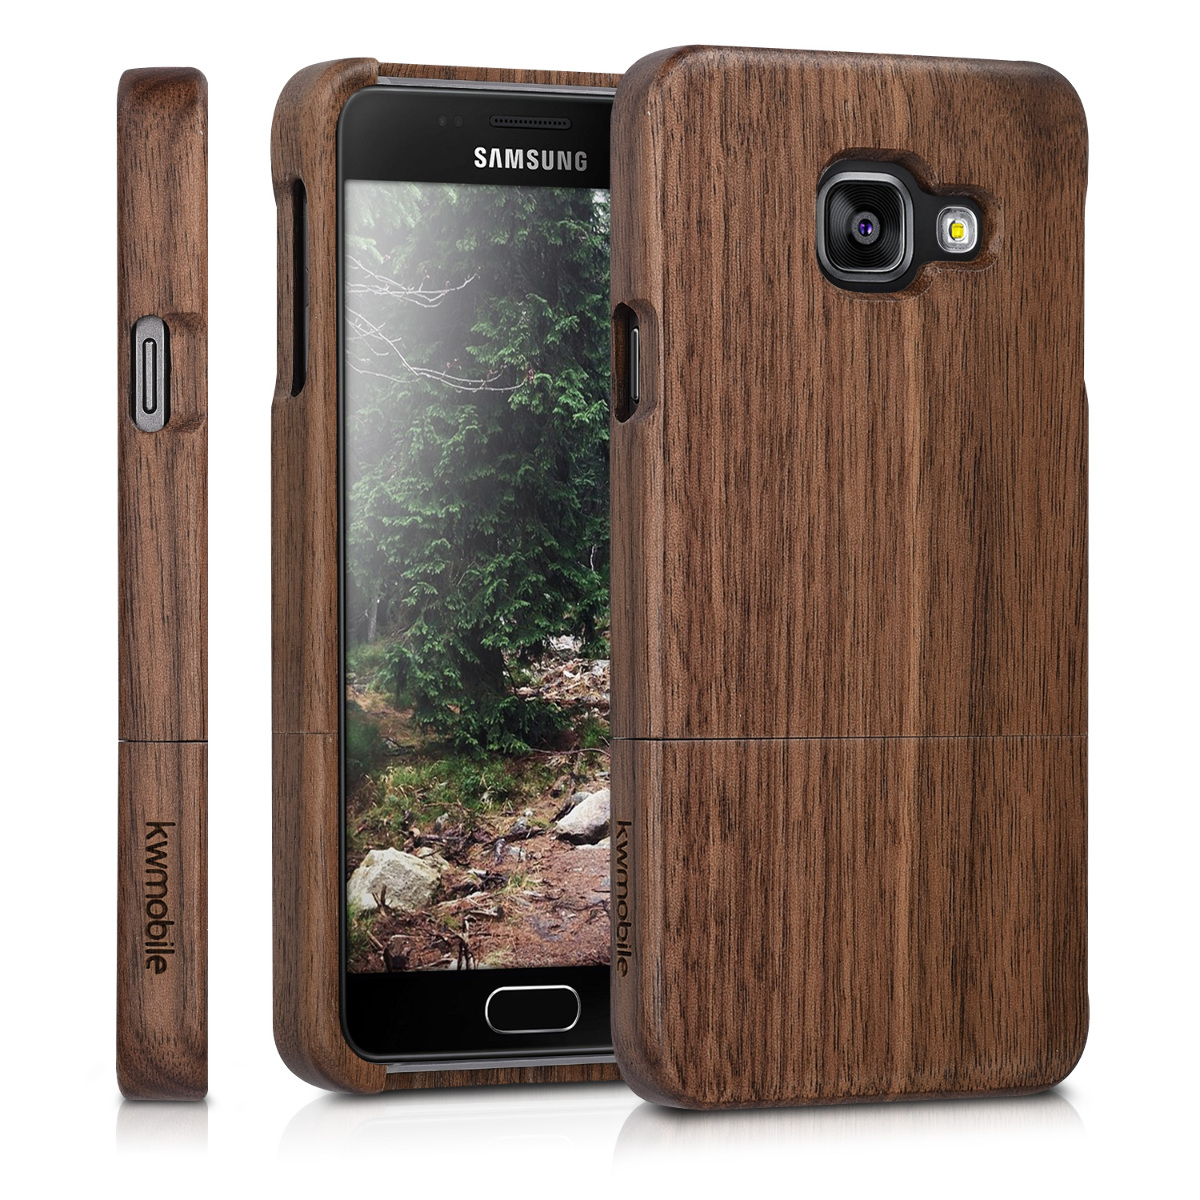 KW Σκληρή Ξύλινη Θήκη - Samsung Galaxy A3 (2016) - Dark Brown - (36072.05)